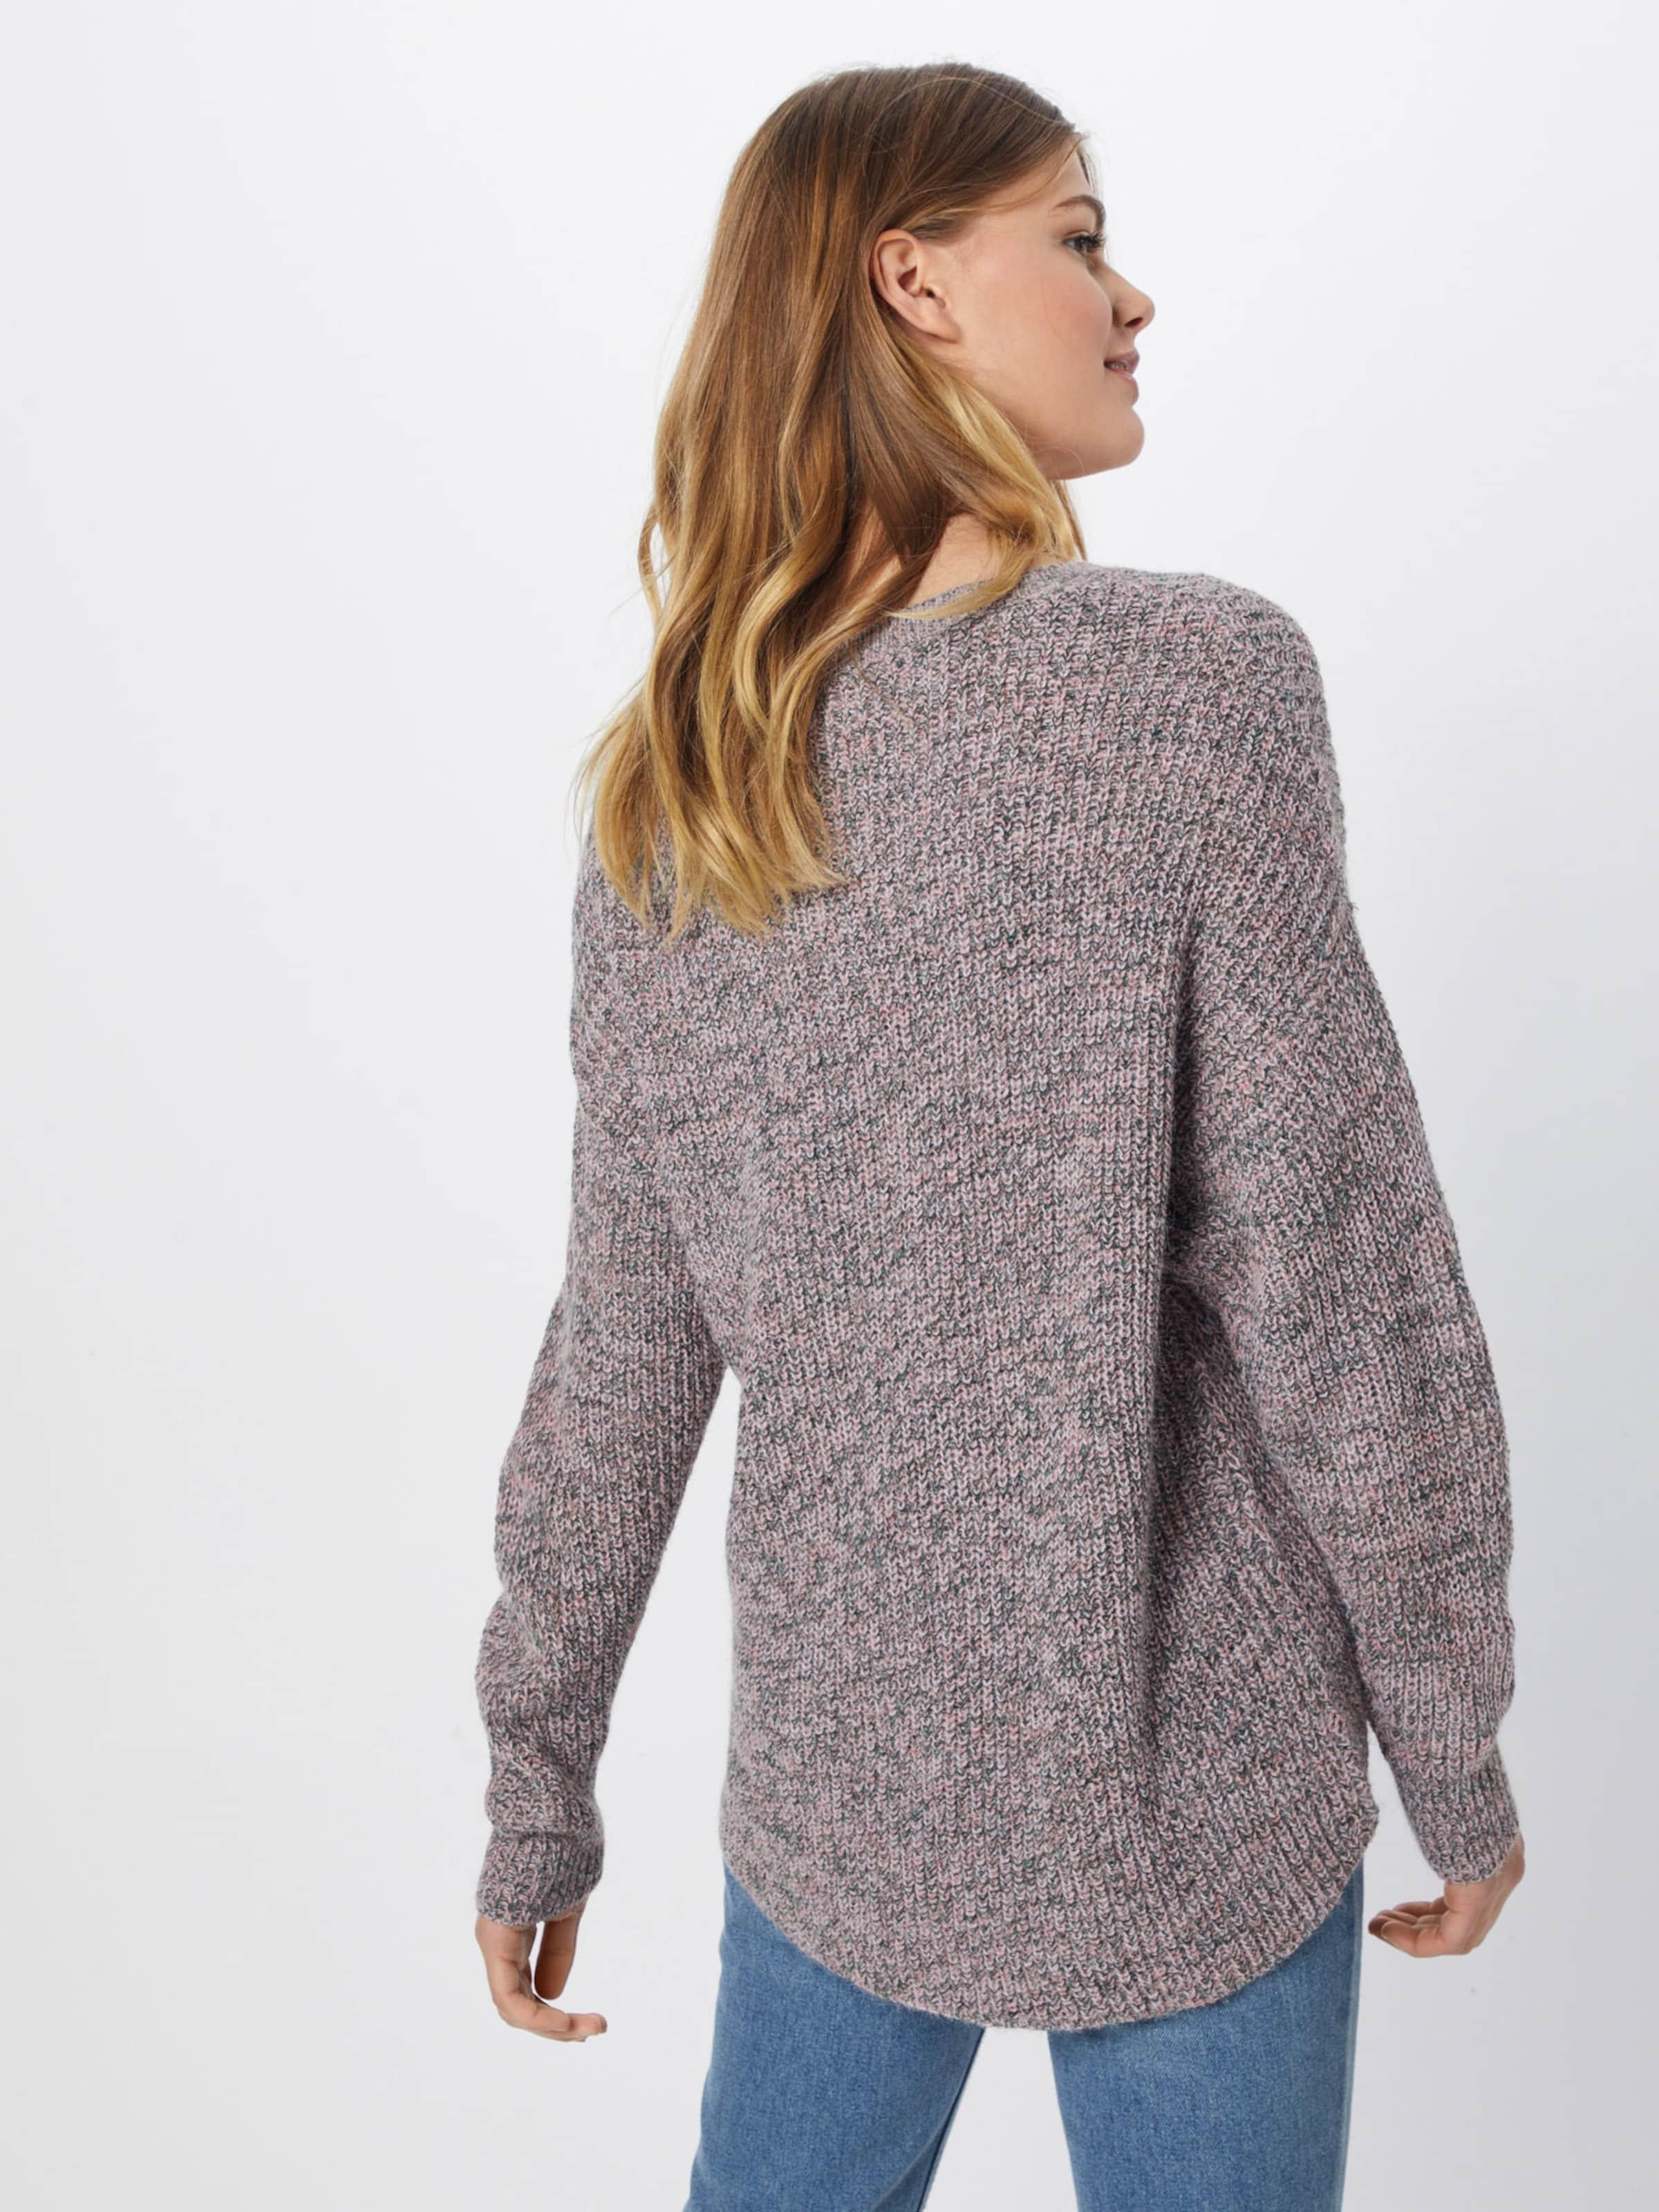 Pullover Pullover In In Gr��nRosa Gr��nRosa Vila 'kaleida' 'kaleida' Vila QroCxeEdBW